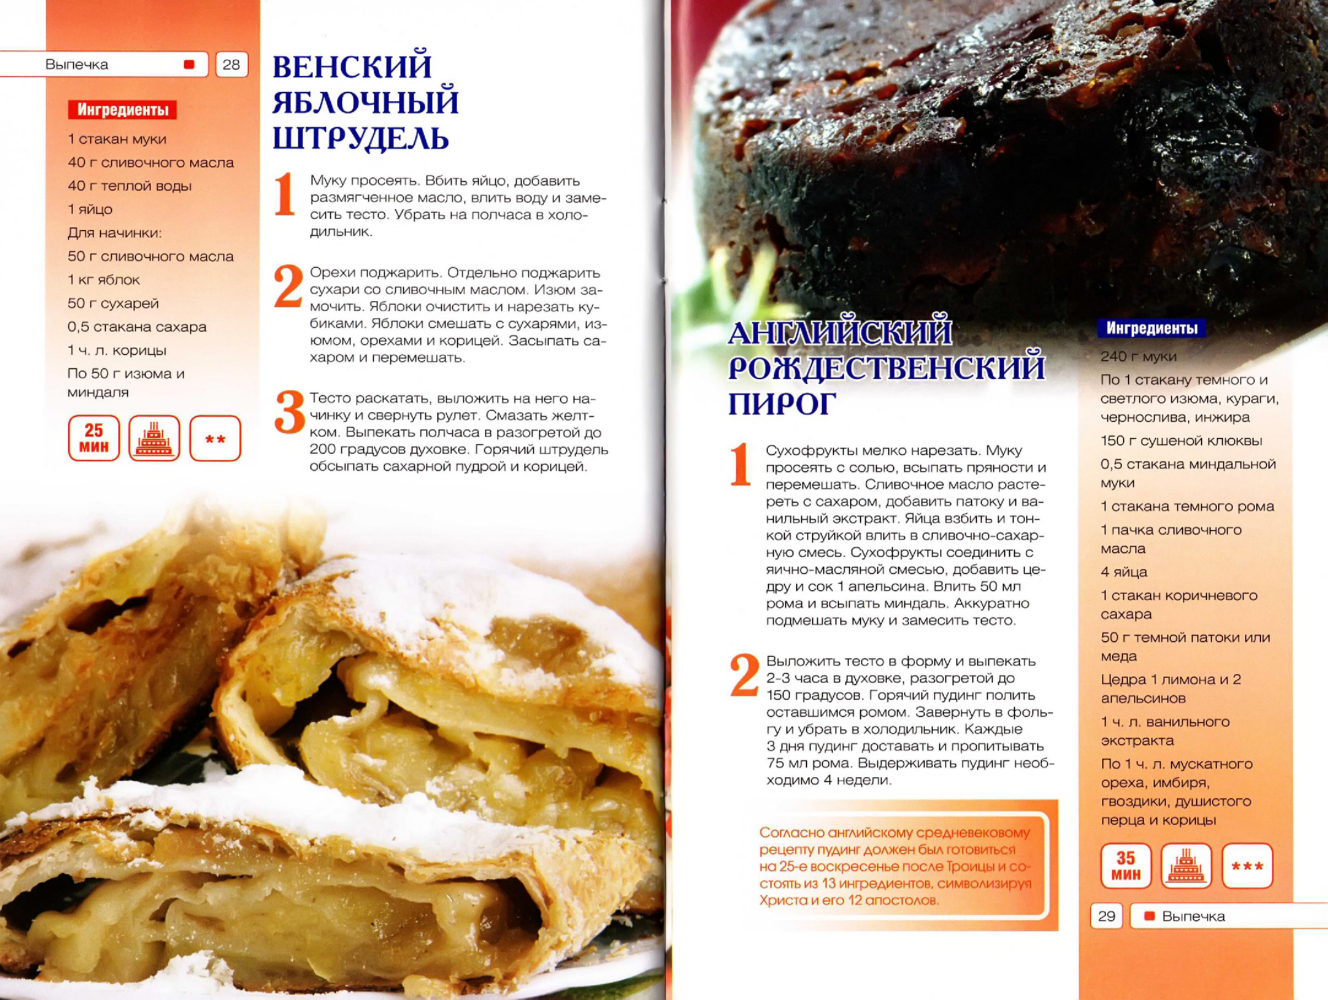 http://i6.imageban.ru/out/2013/12/20/b7240ed066d6ff4315a8a18abcf3a023.jpg